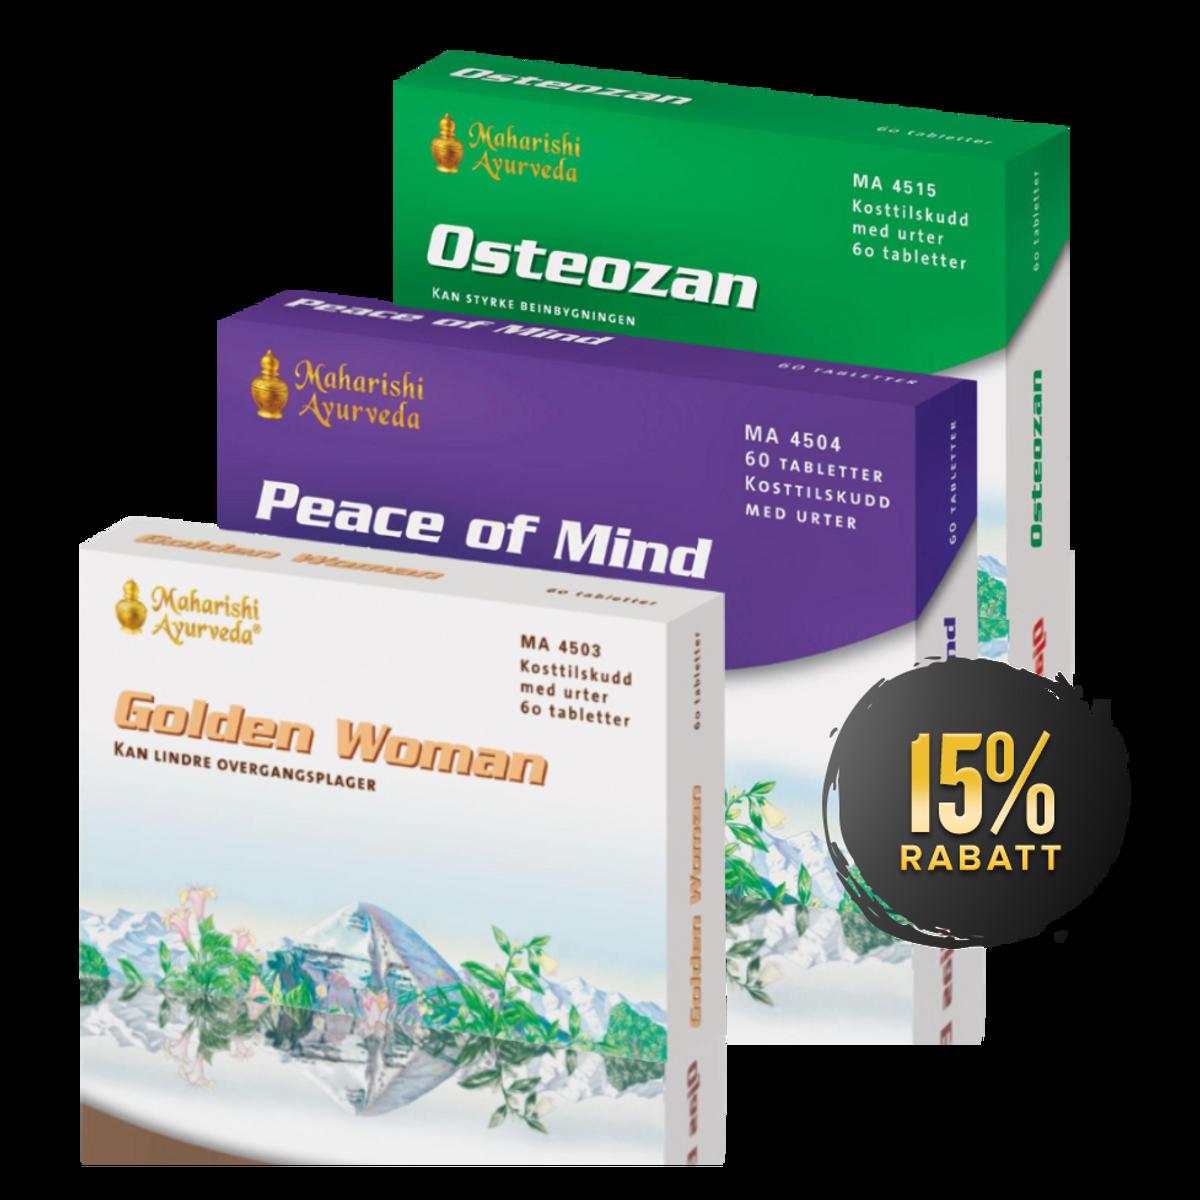 Pakke mot overgangsplager (Golden Woman + Osteozan + Peace of Mi